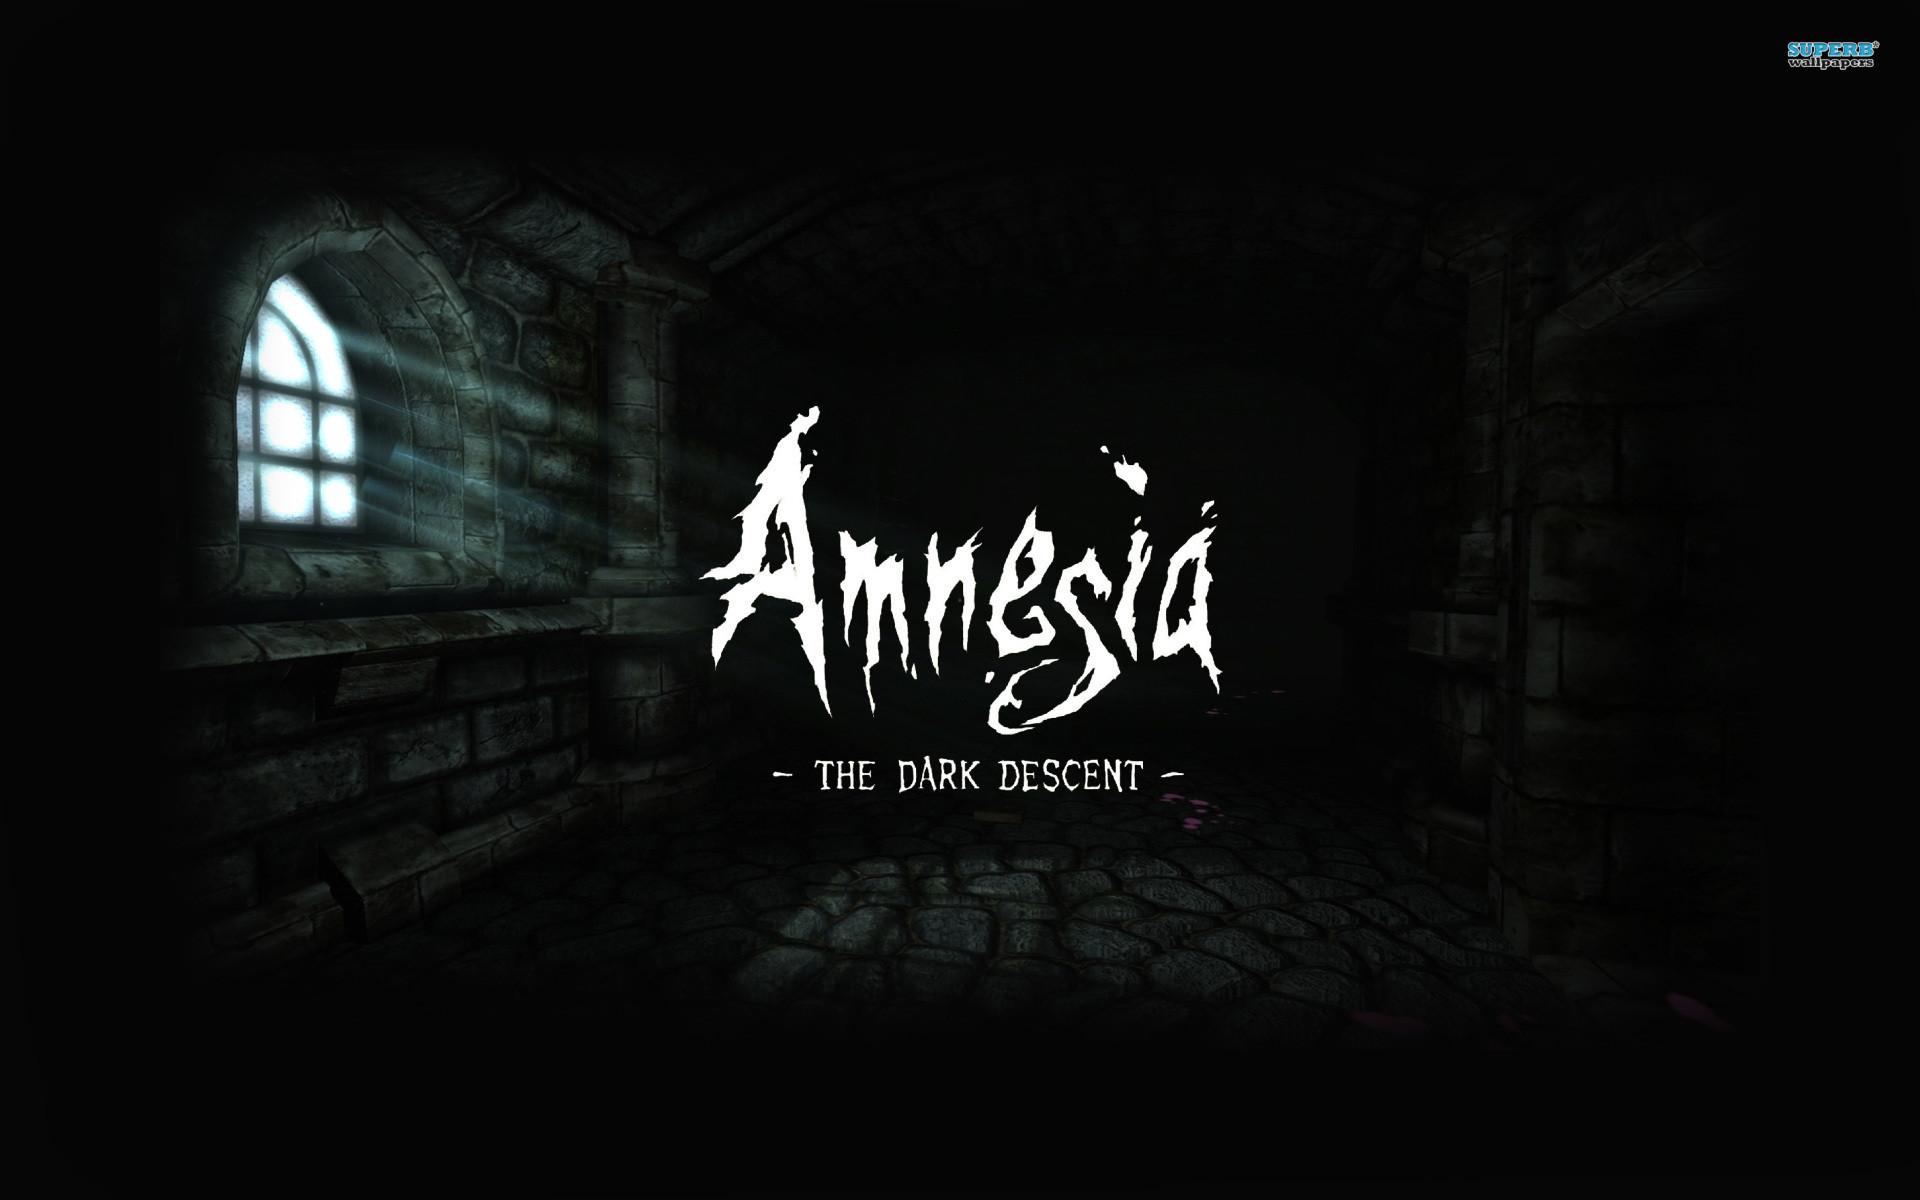 Amnesia the Dark Descent Wallpaper 86 images 1920x1200